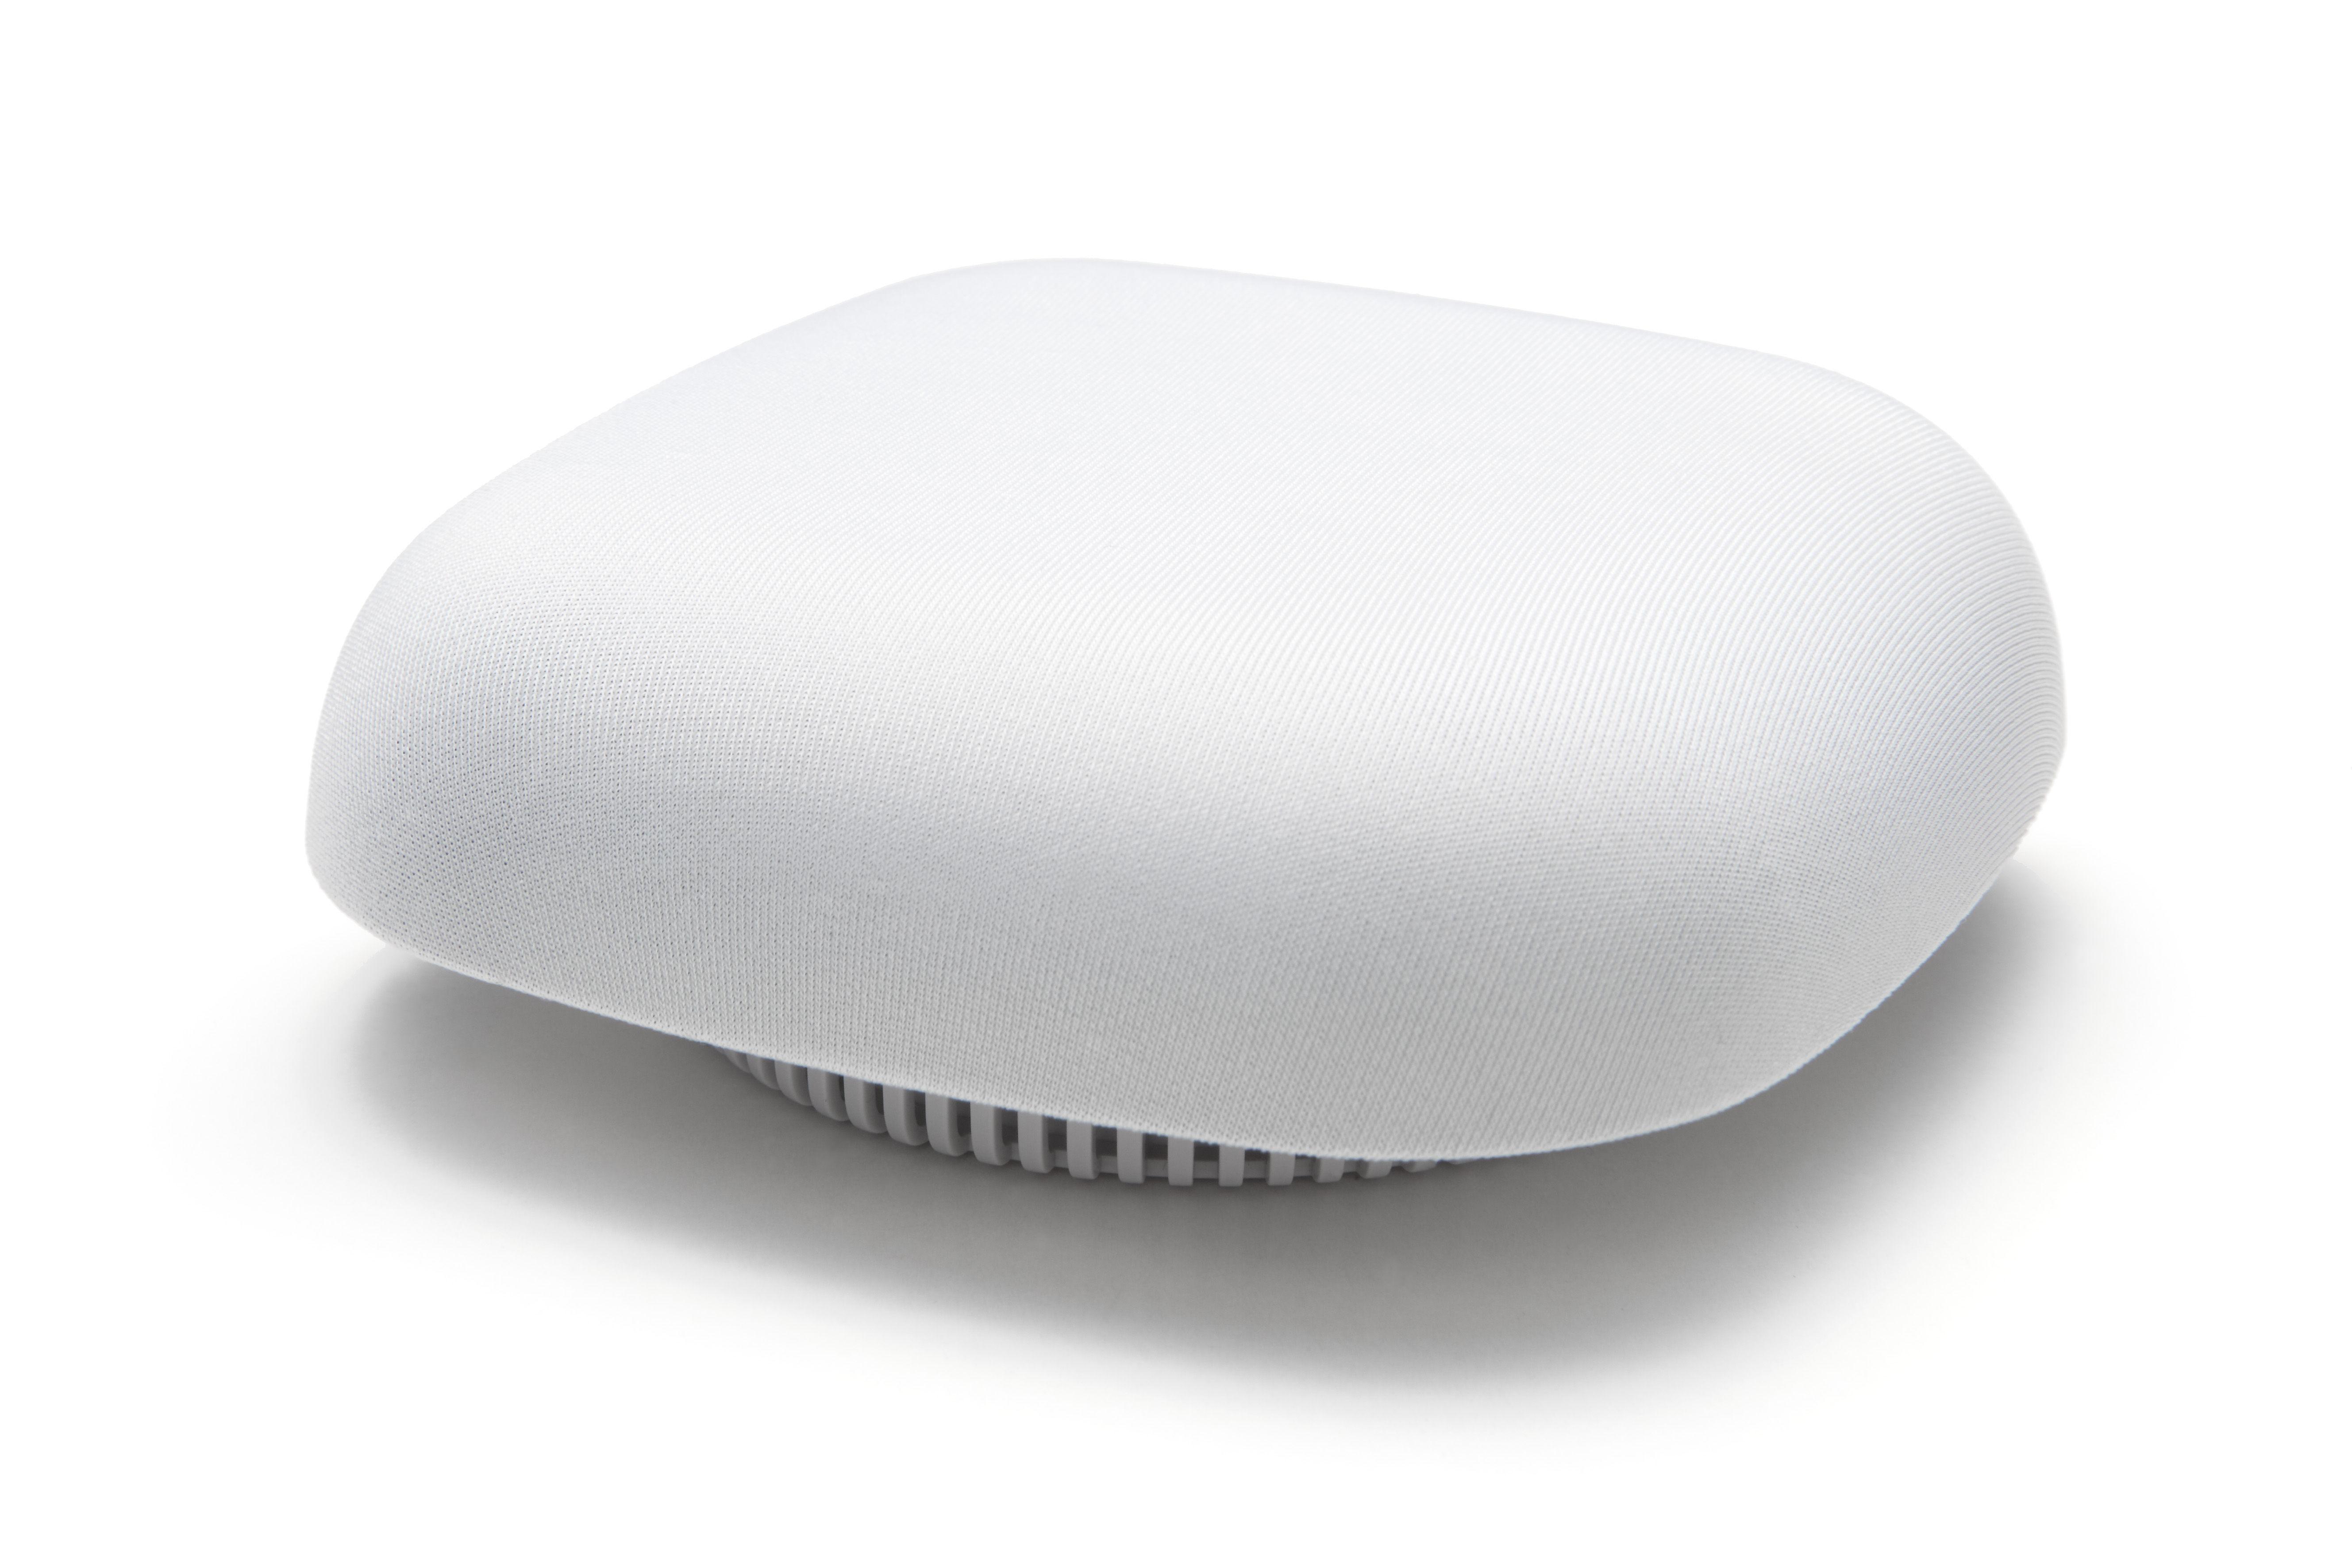 Accessories - Home Accessories - Kupu Smoke alarm - Sticky by Jalo Helsinki - White - Fabric, Plastic material